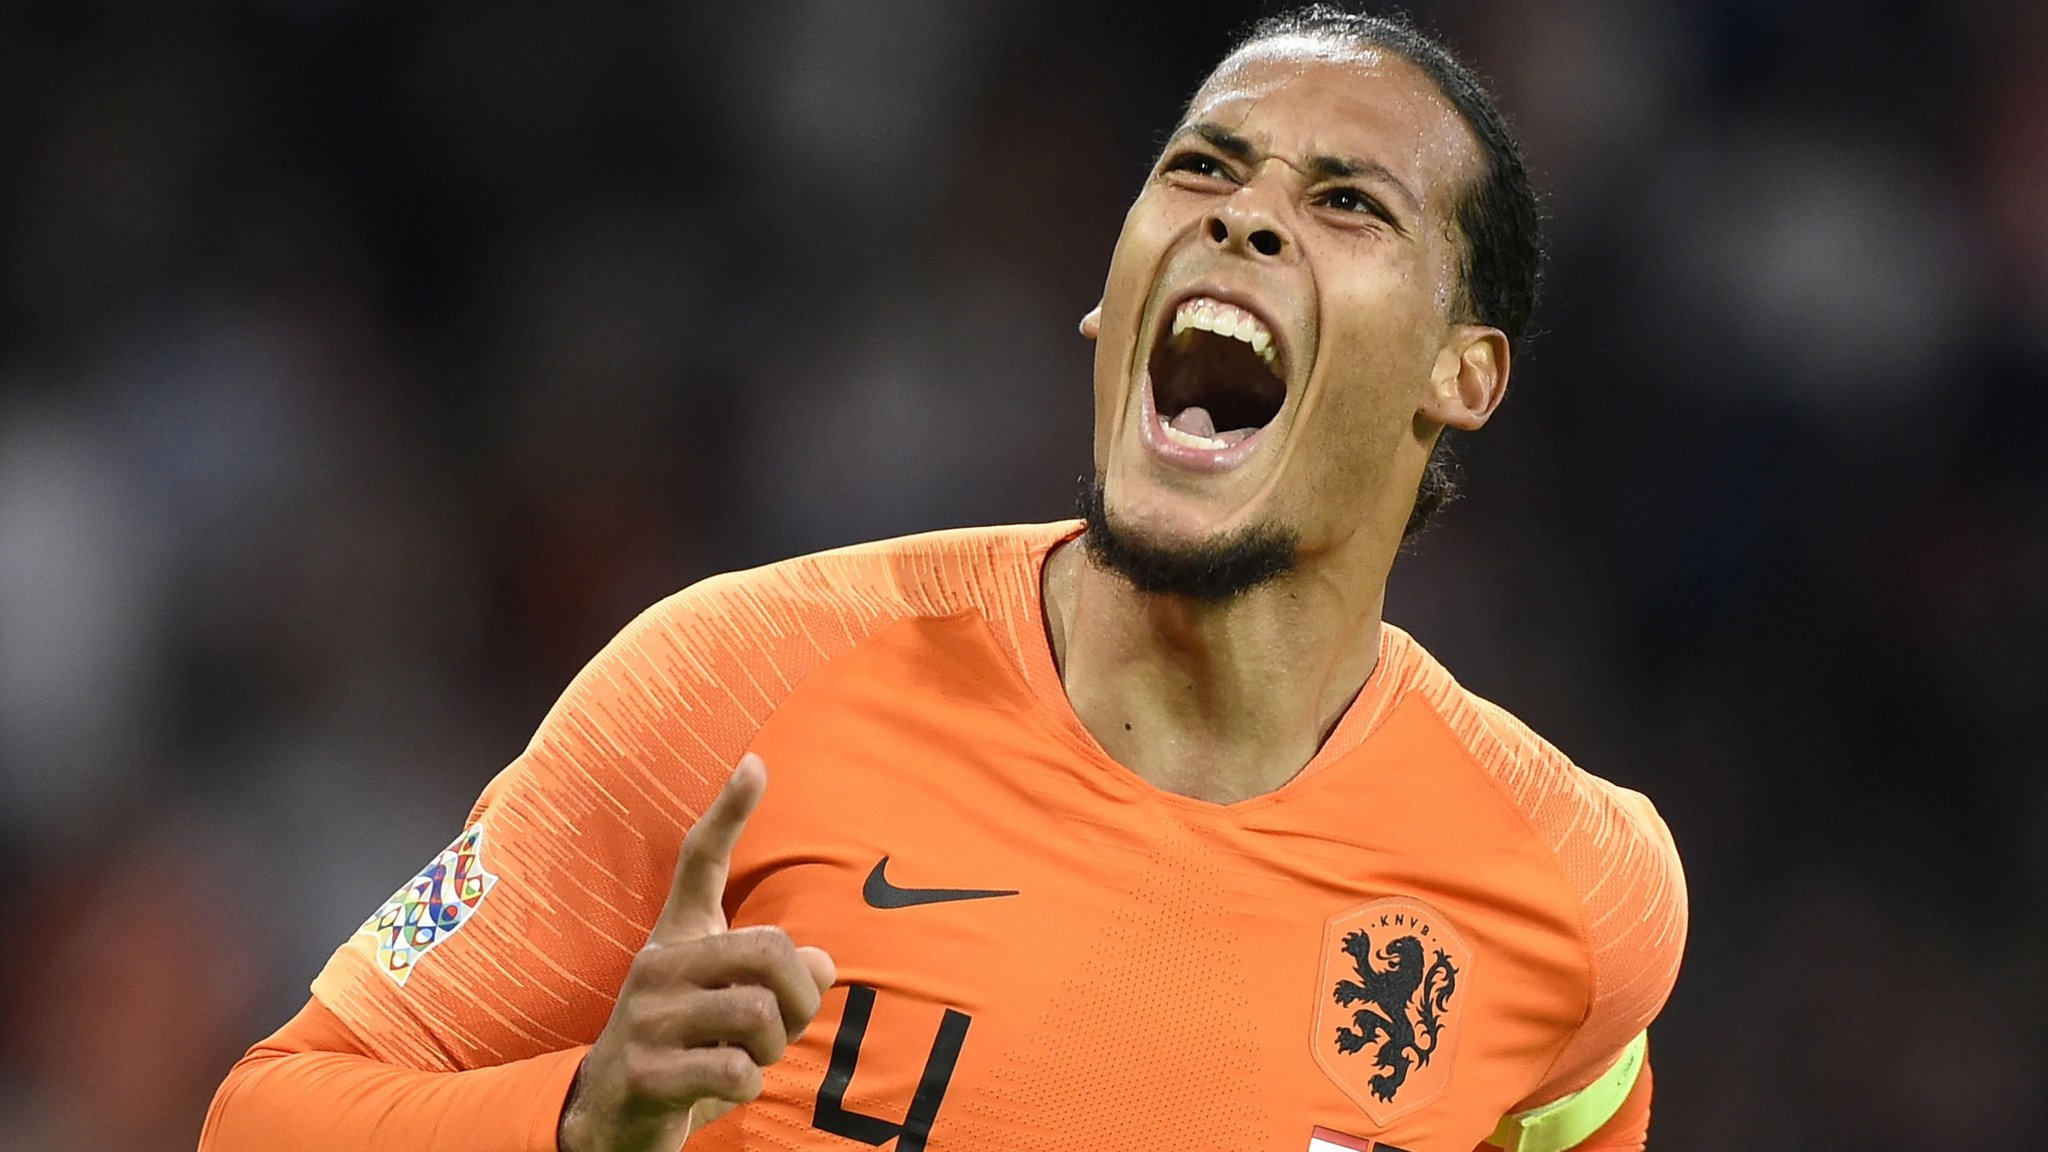 Virgil van Dijk: Liverpool and Netherlands defender to miss Belgium game with rib injury